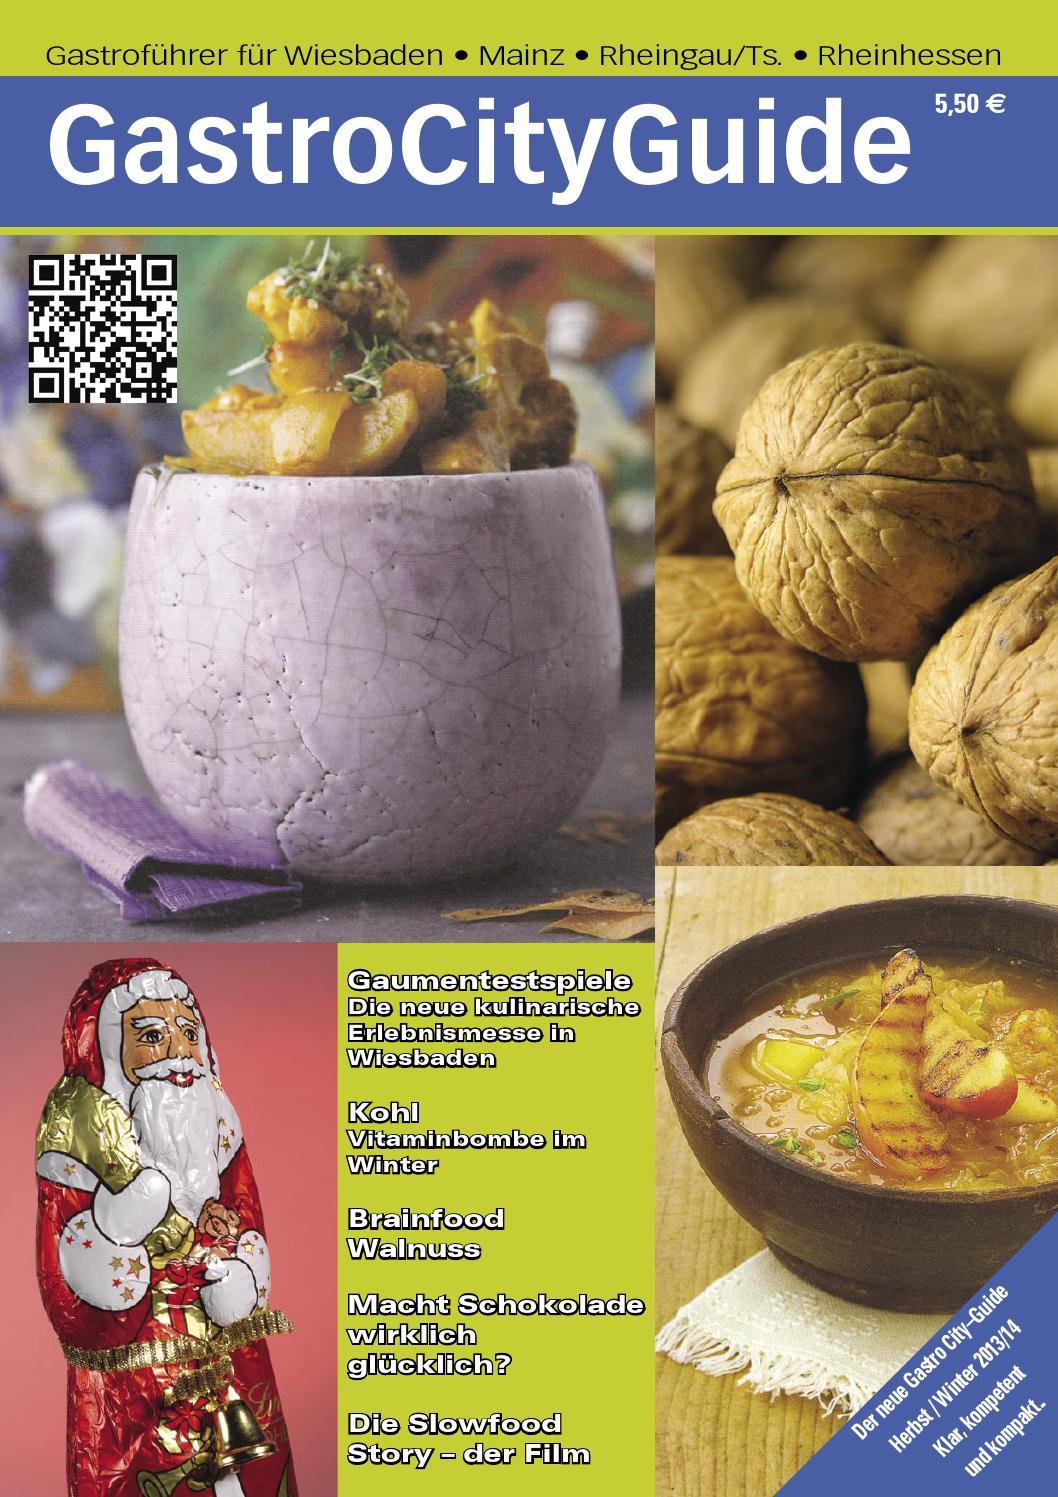 GastroCityGuide, Ausgabe 0213 by Petra Esser - issuu